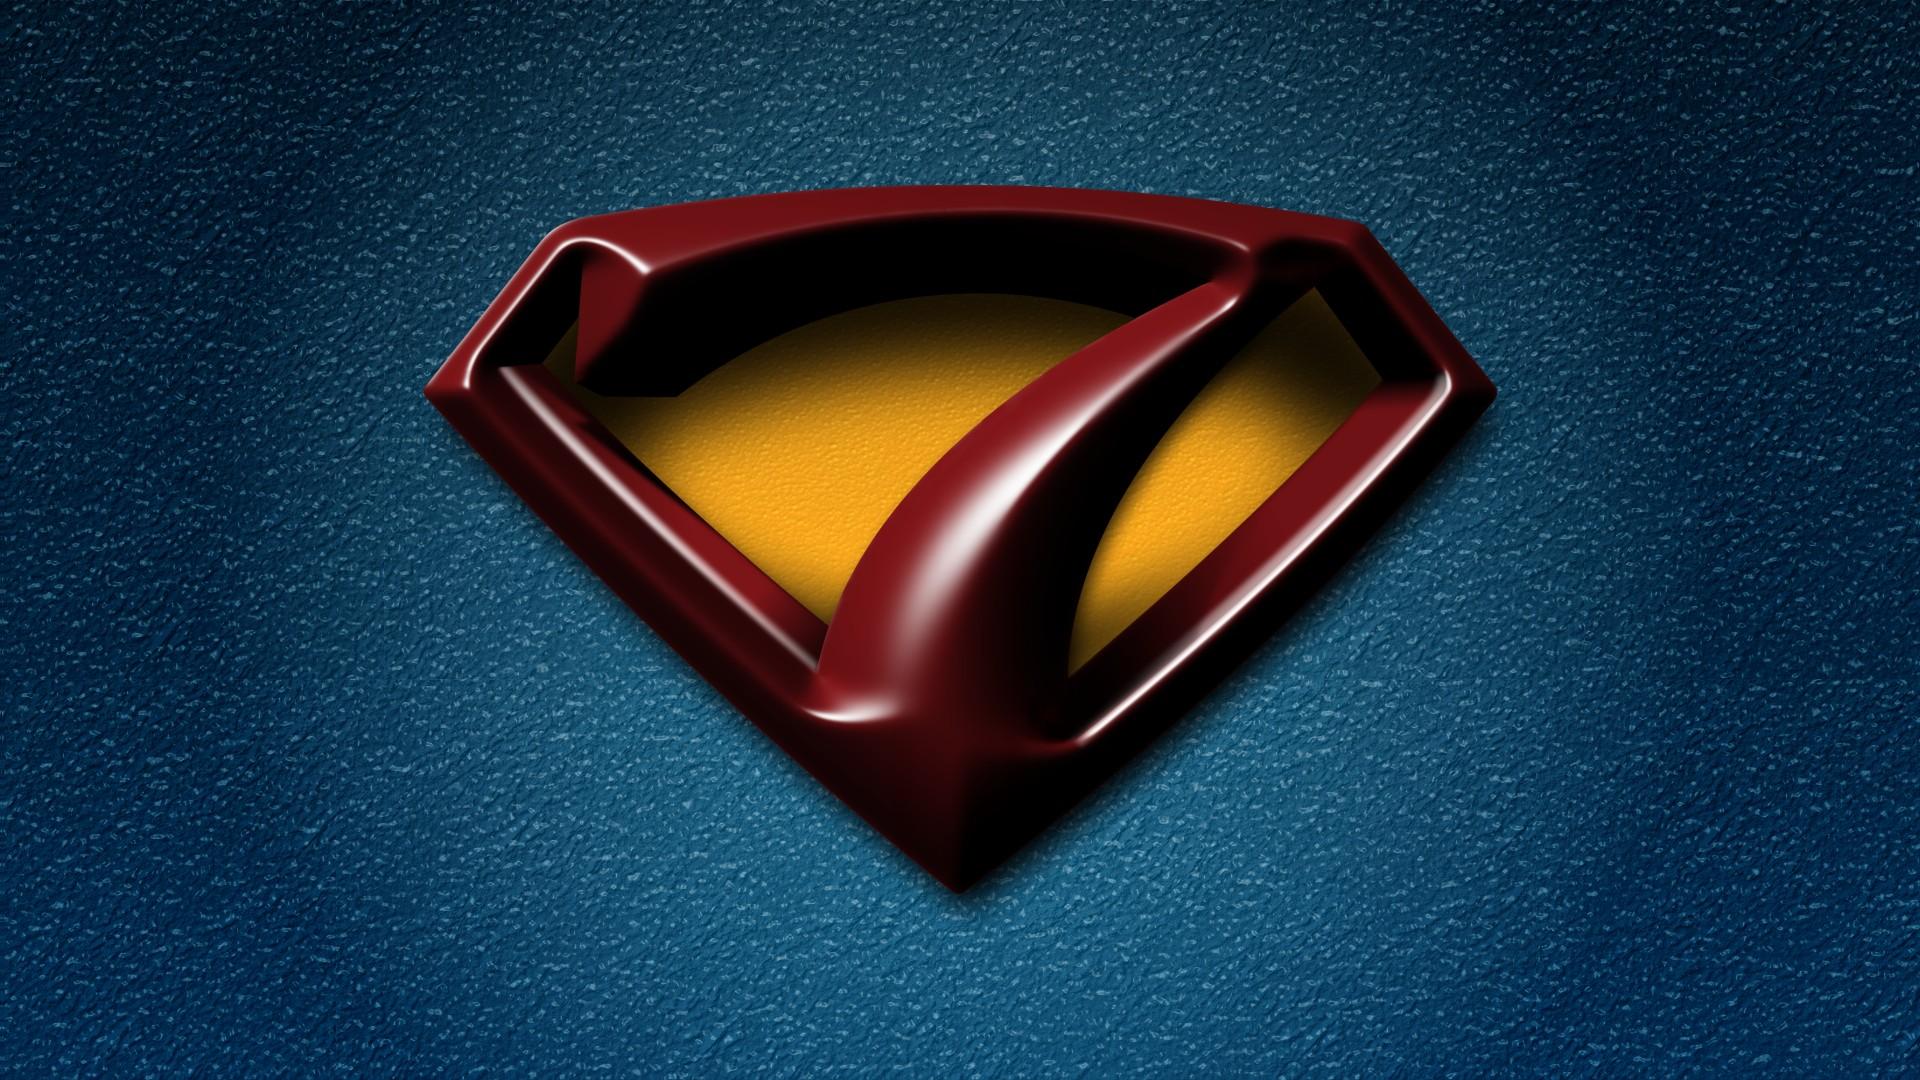 Windows 7 superman superman logo free wallpaper wallpaperjam buycottarizona Gallery